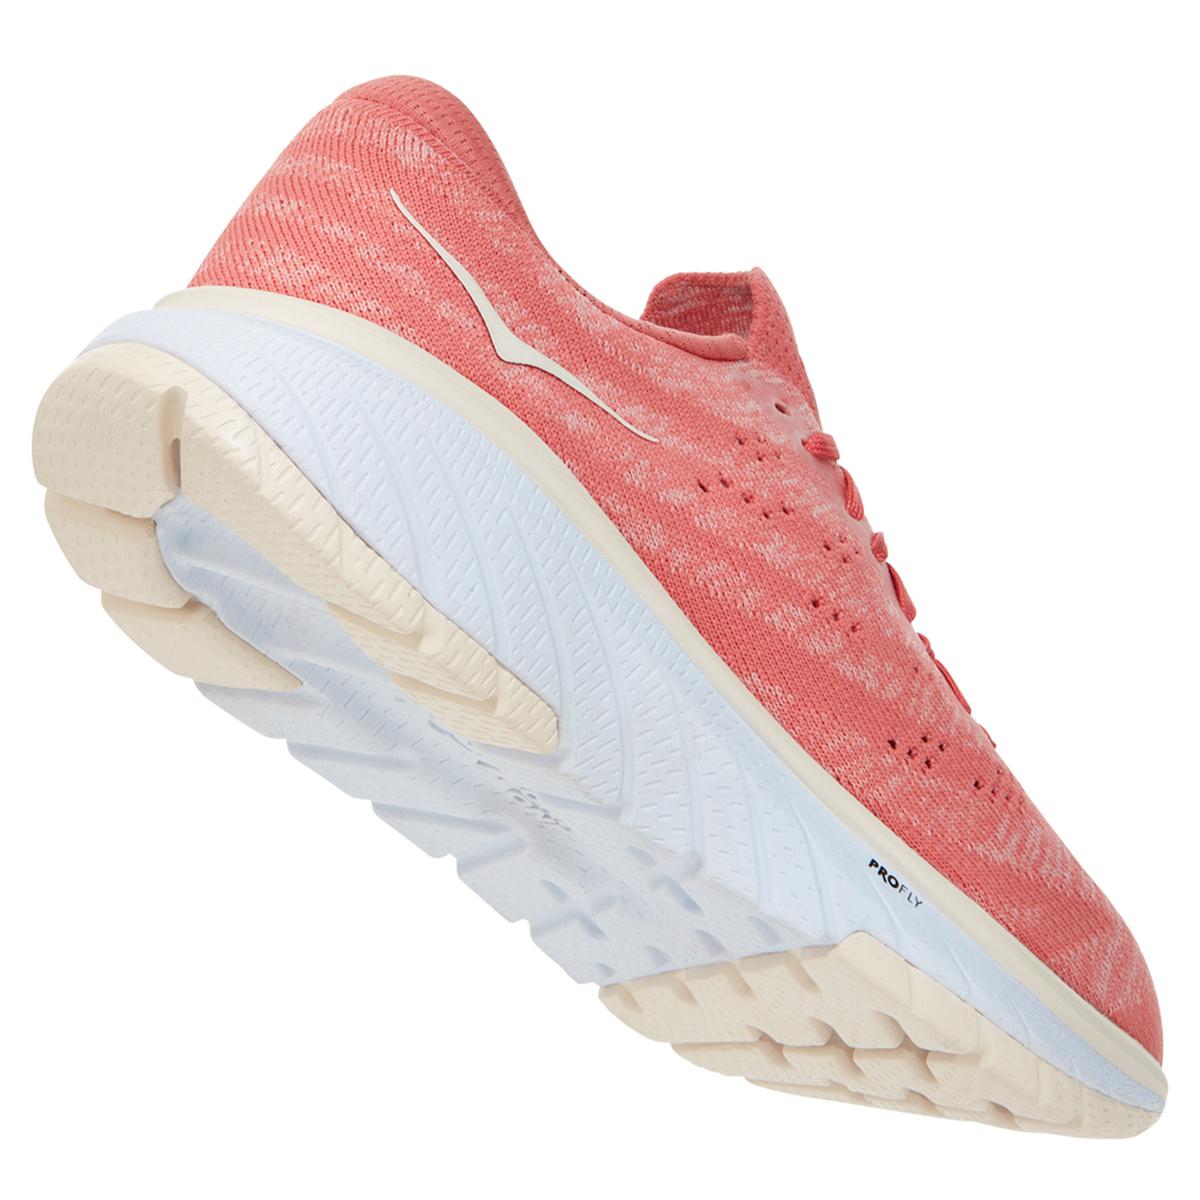 Women's Hoka One One Cavu 3 Running Shoe - Color: Lantana/Eggnog - Size: 5 - Width: Regular, Lantana/Eggnog, large, image 6